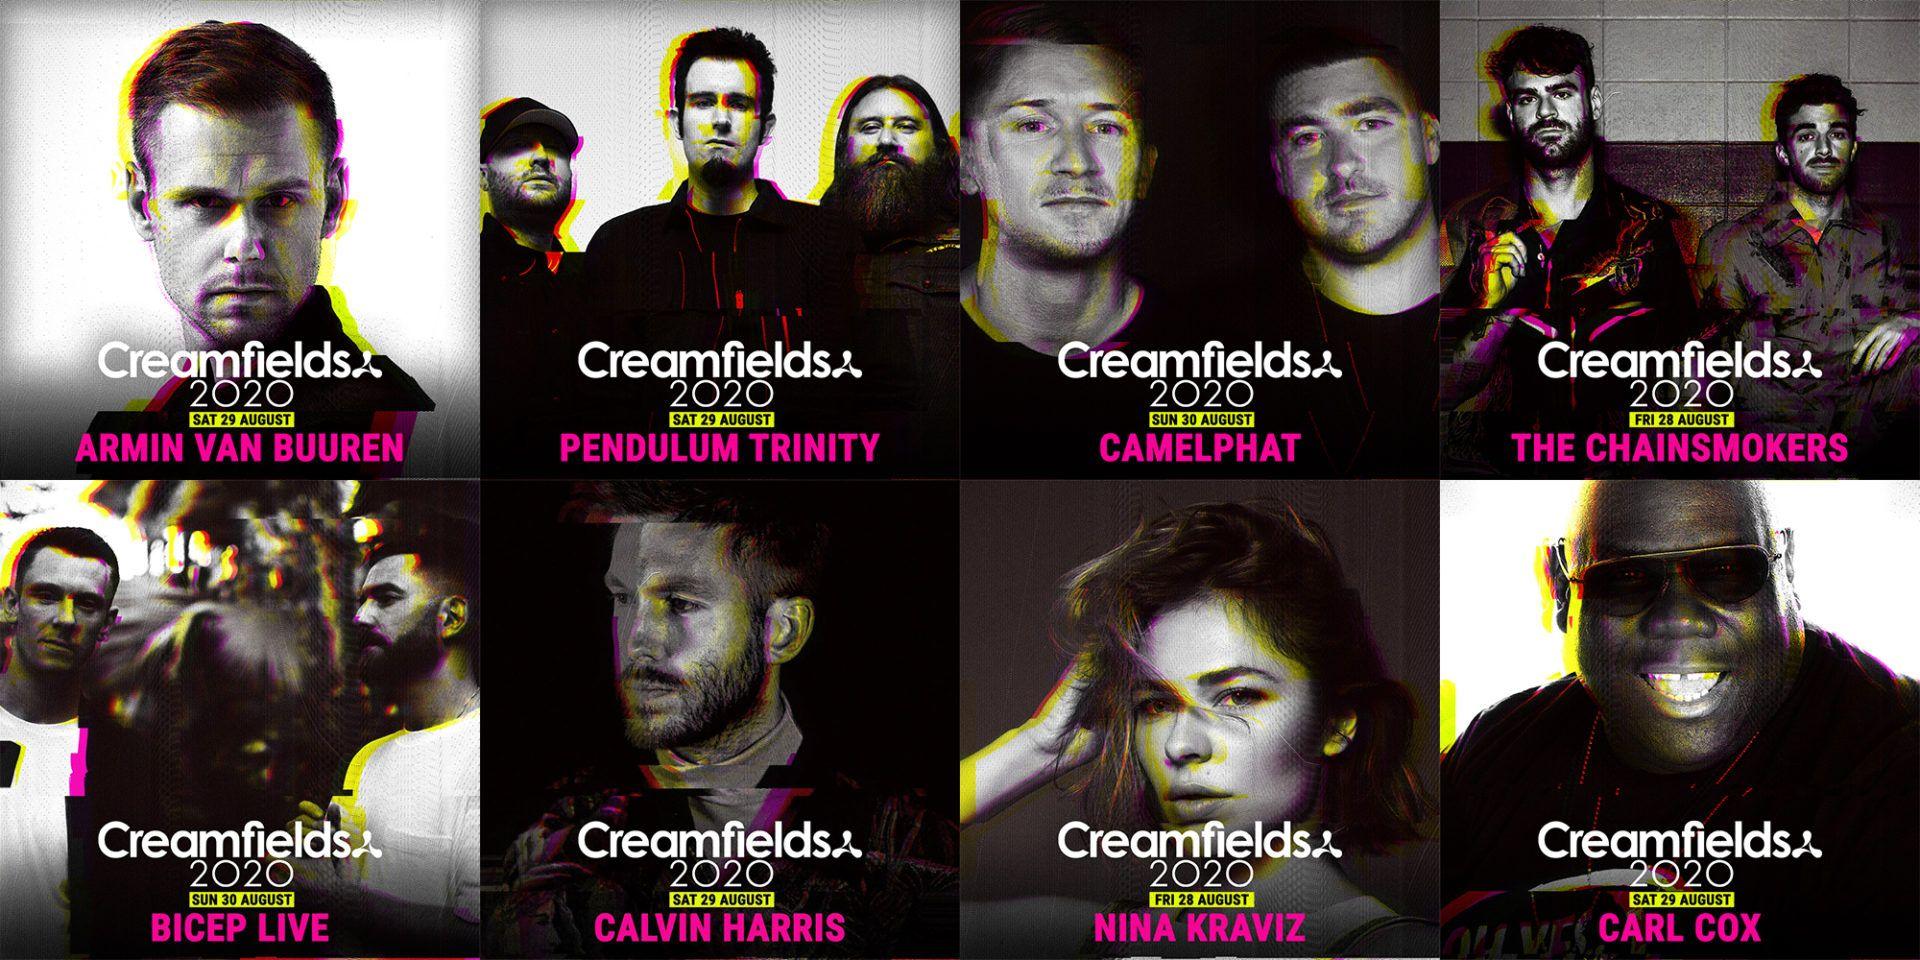 Creamfields 2020